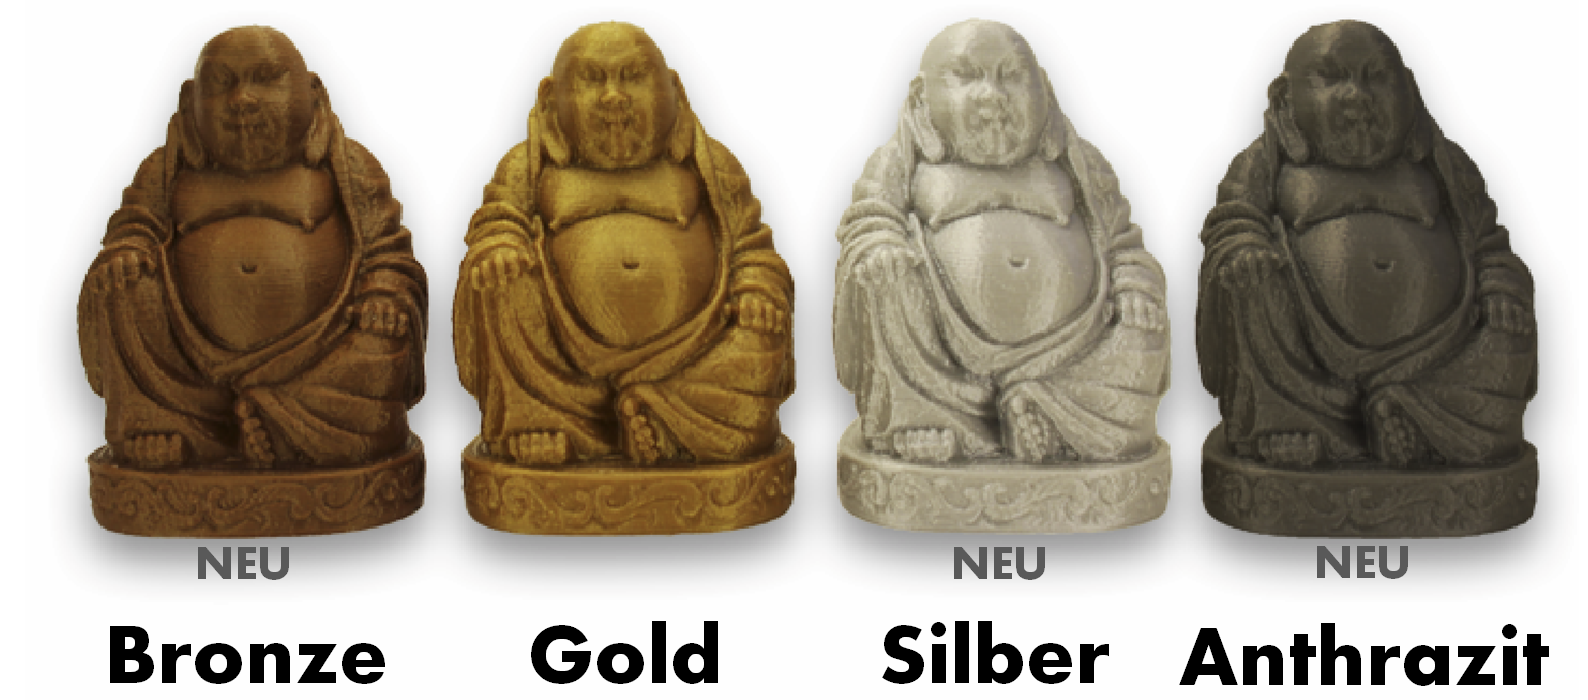 Neu - Bronze / Silber / Anthrazit